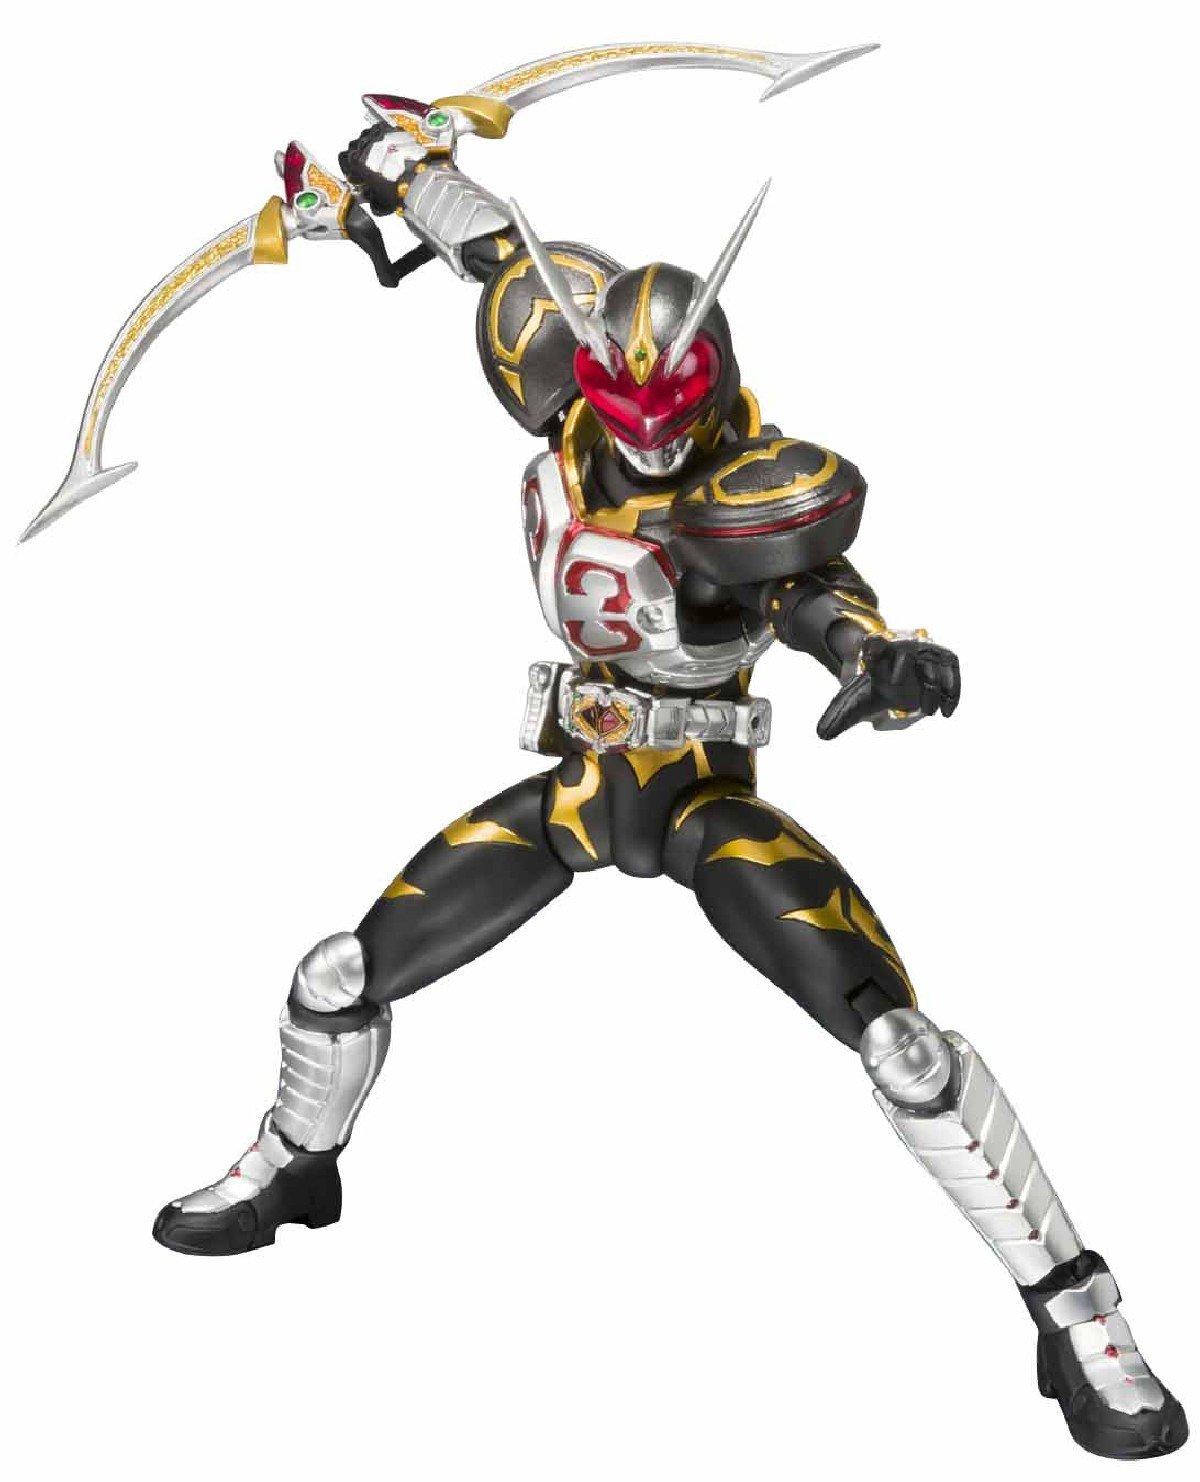 Bandai Tamashii Nations Kamen Rider Chalice Kamen Rider Blade S.H. Figuarts by Bandai